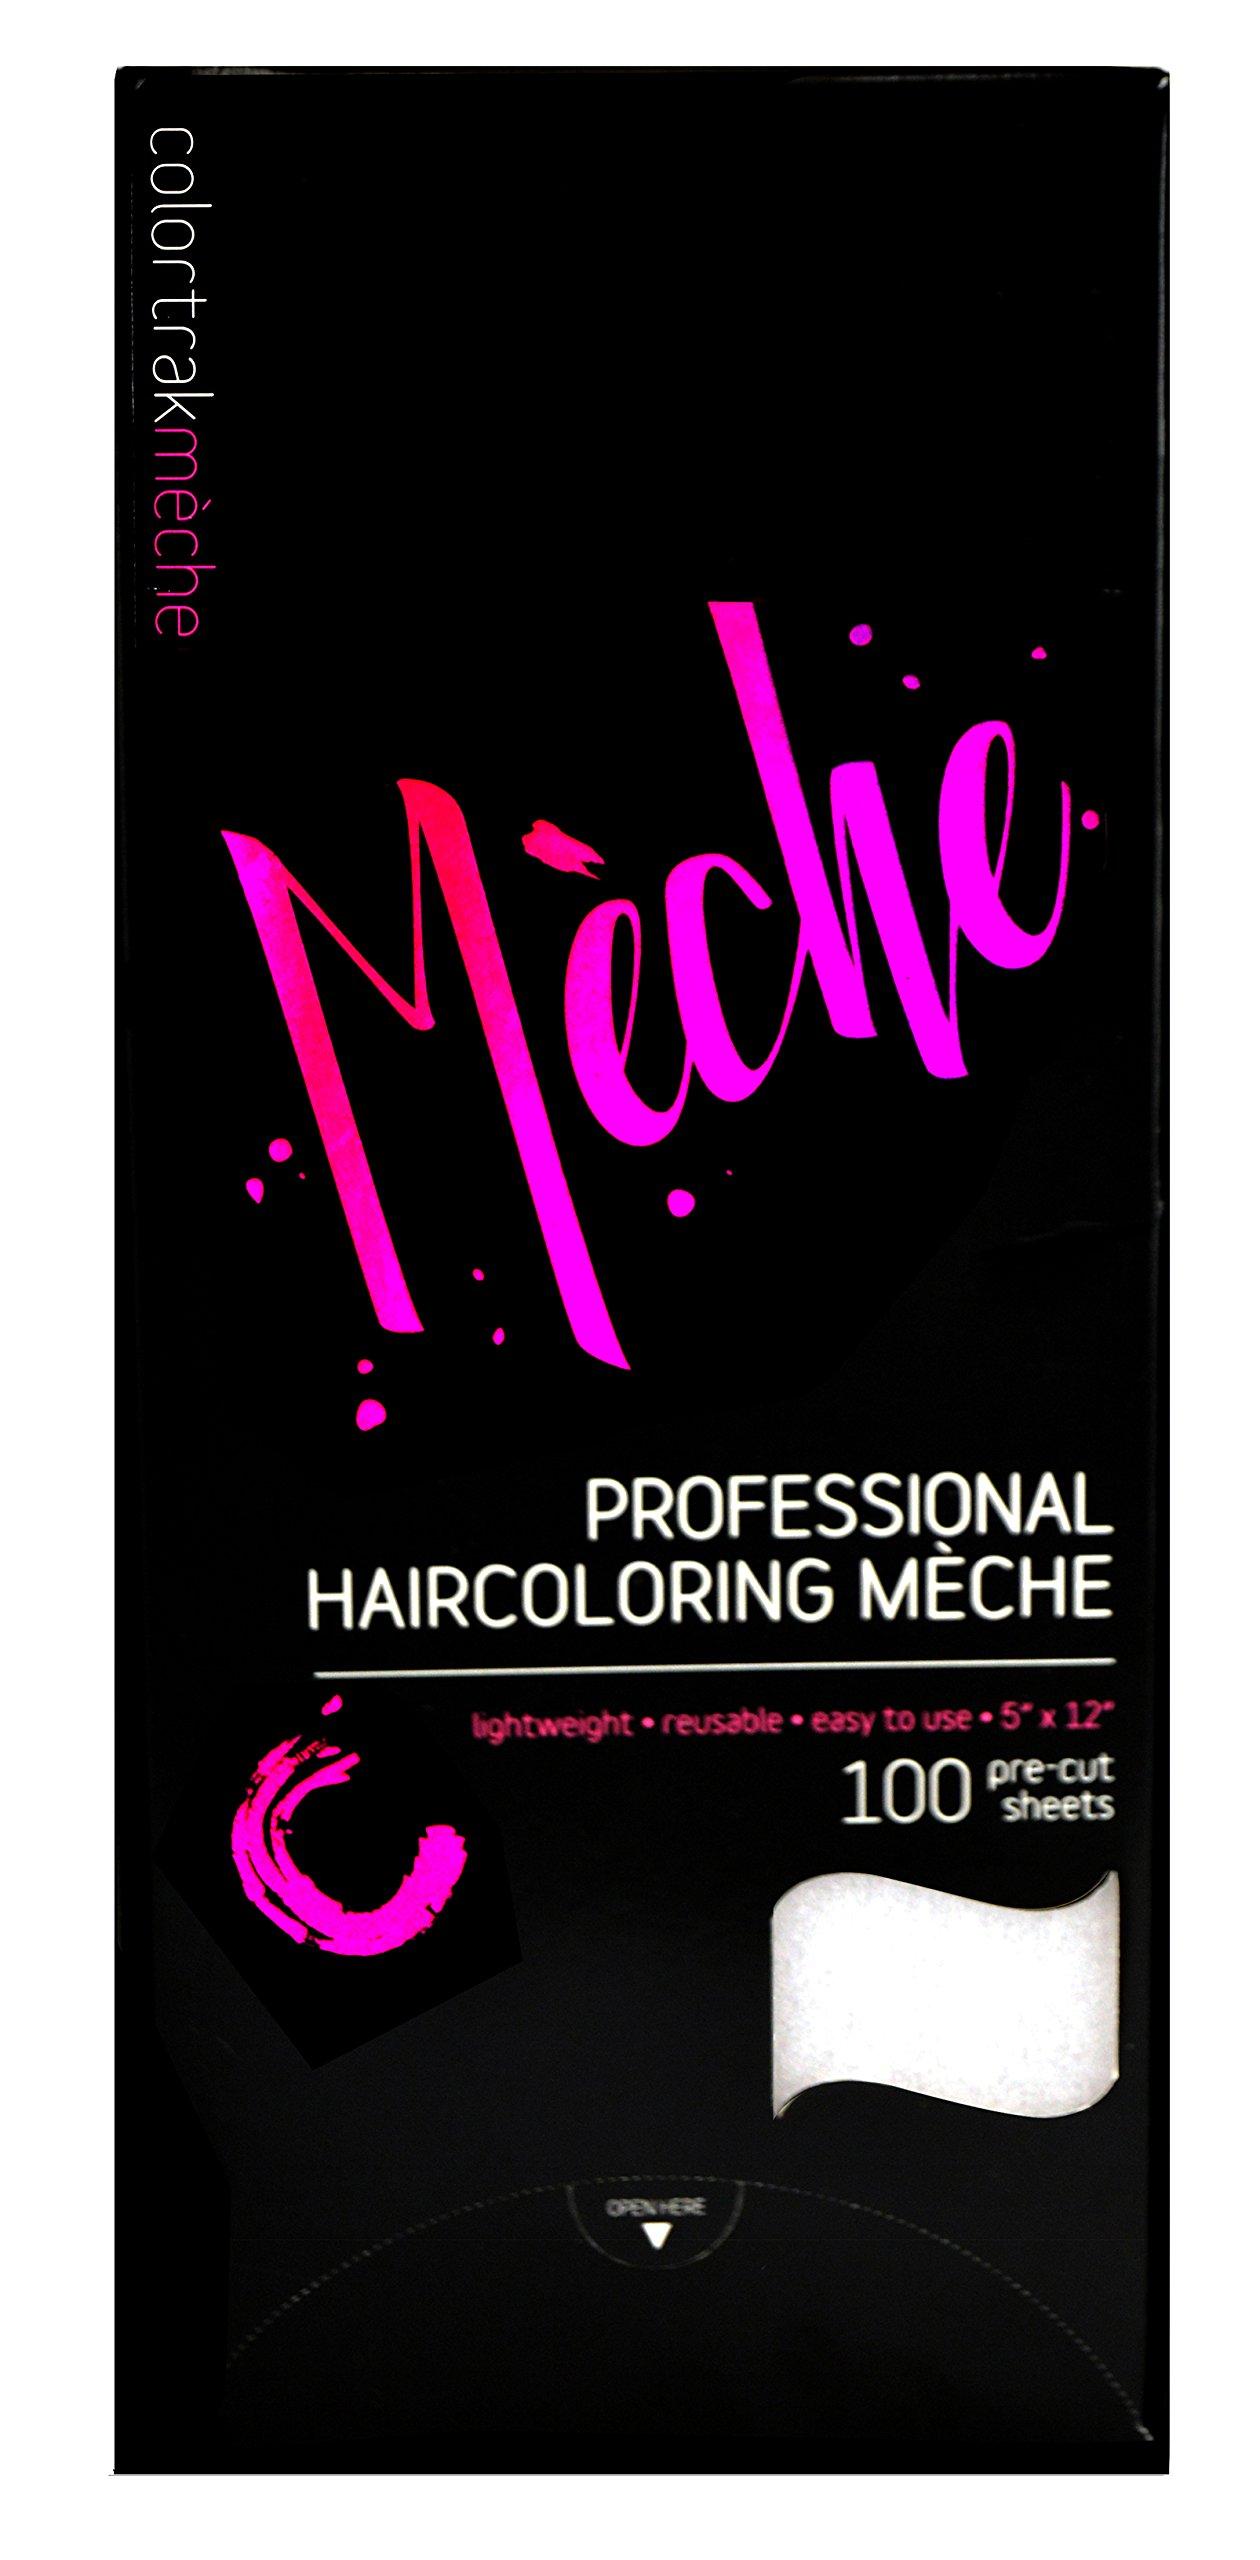 "Colortrak Professional Reusable Hair Coloring Meche Sheets, Standard 5"" x 12"" Size (100 Count)"